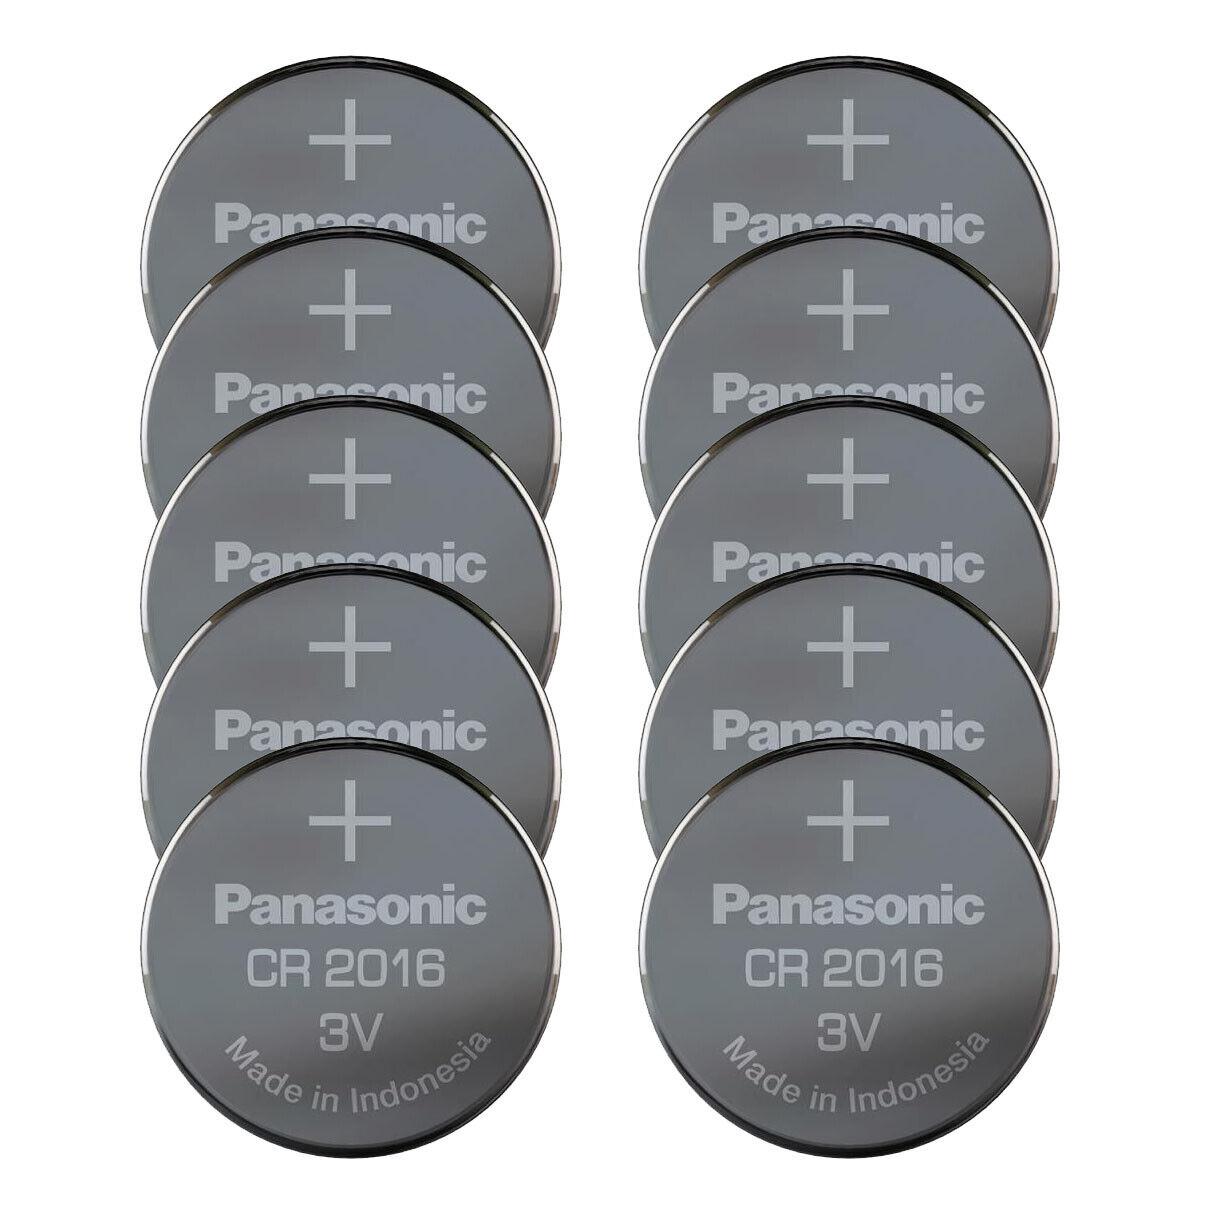 10 x panasonic cr2016 lot button battery 3v replace CR BR DL ECR kcr 2016